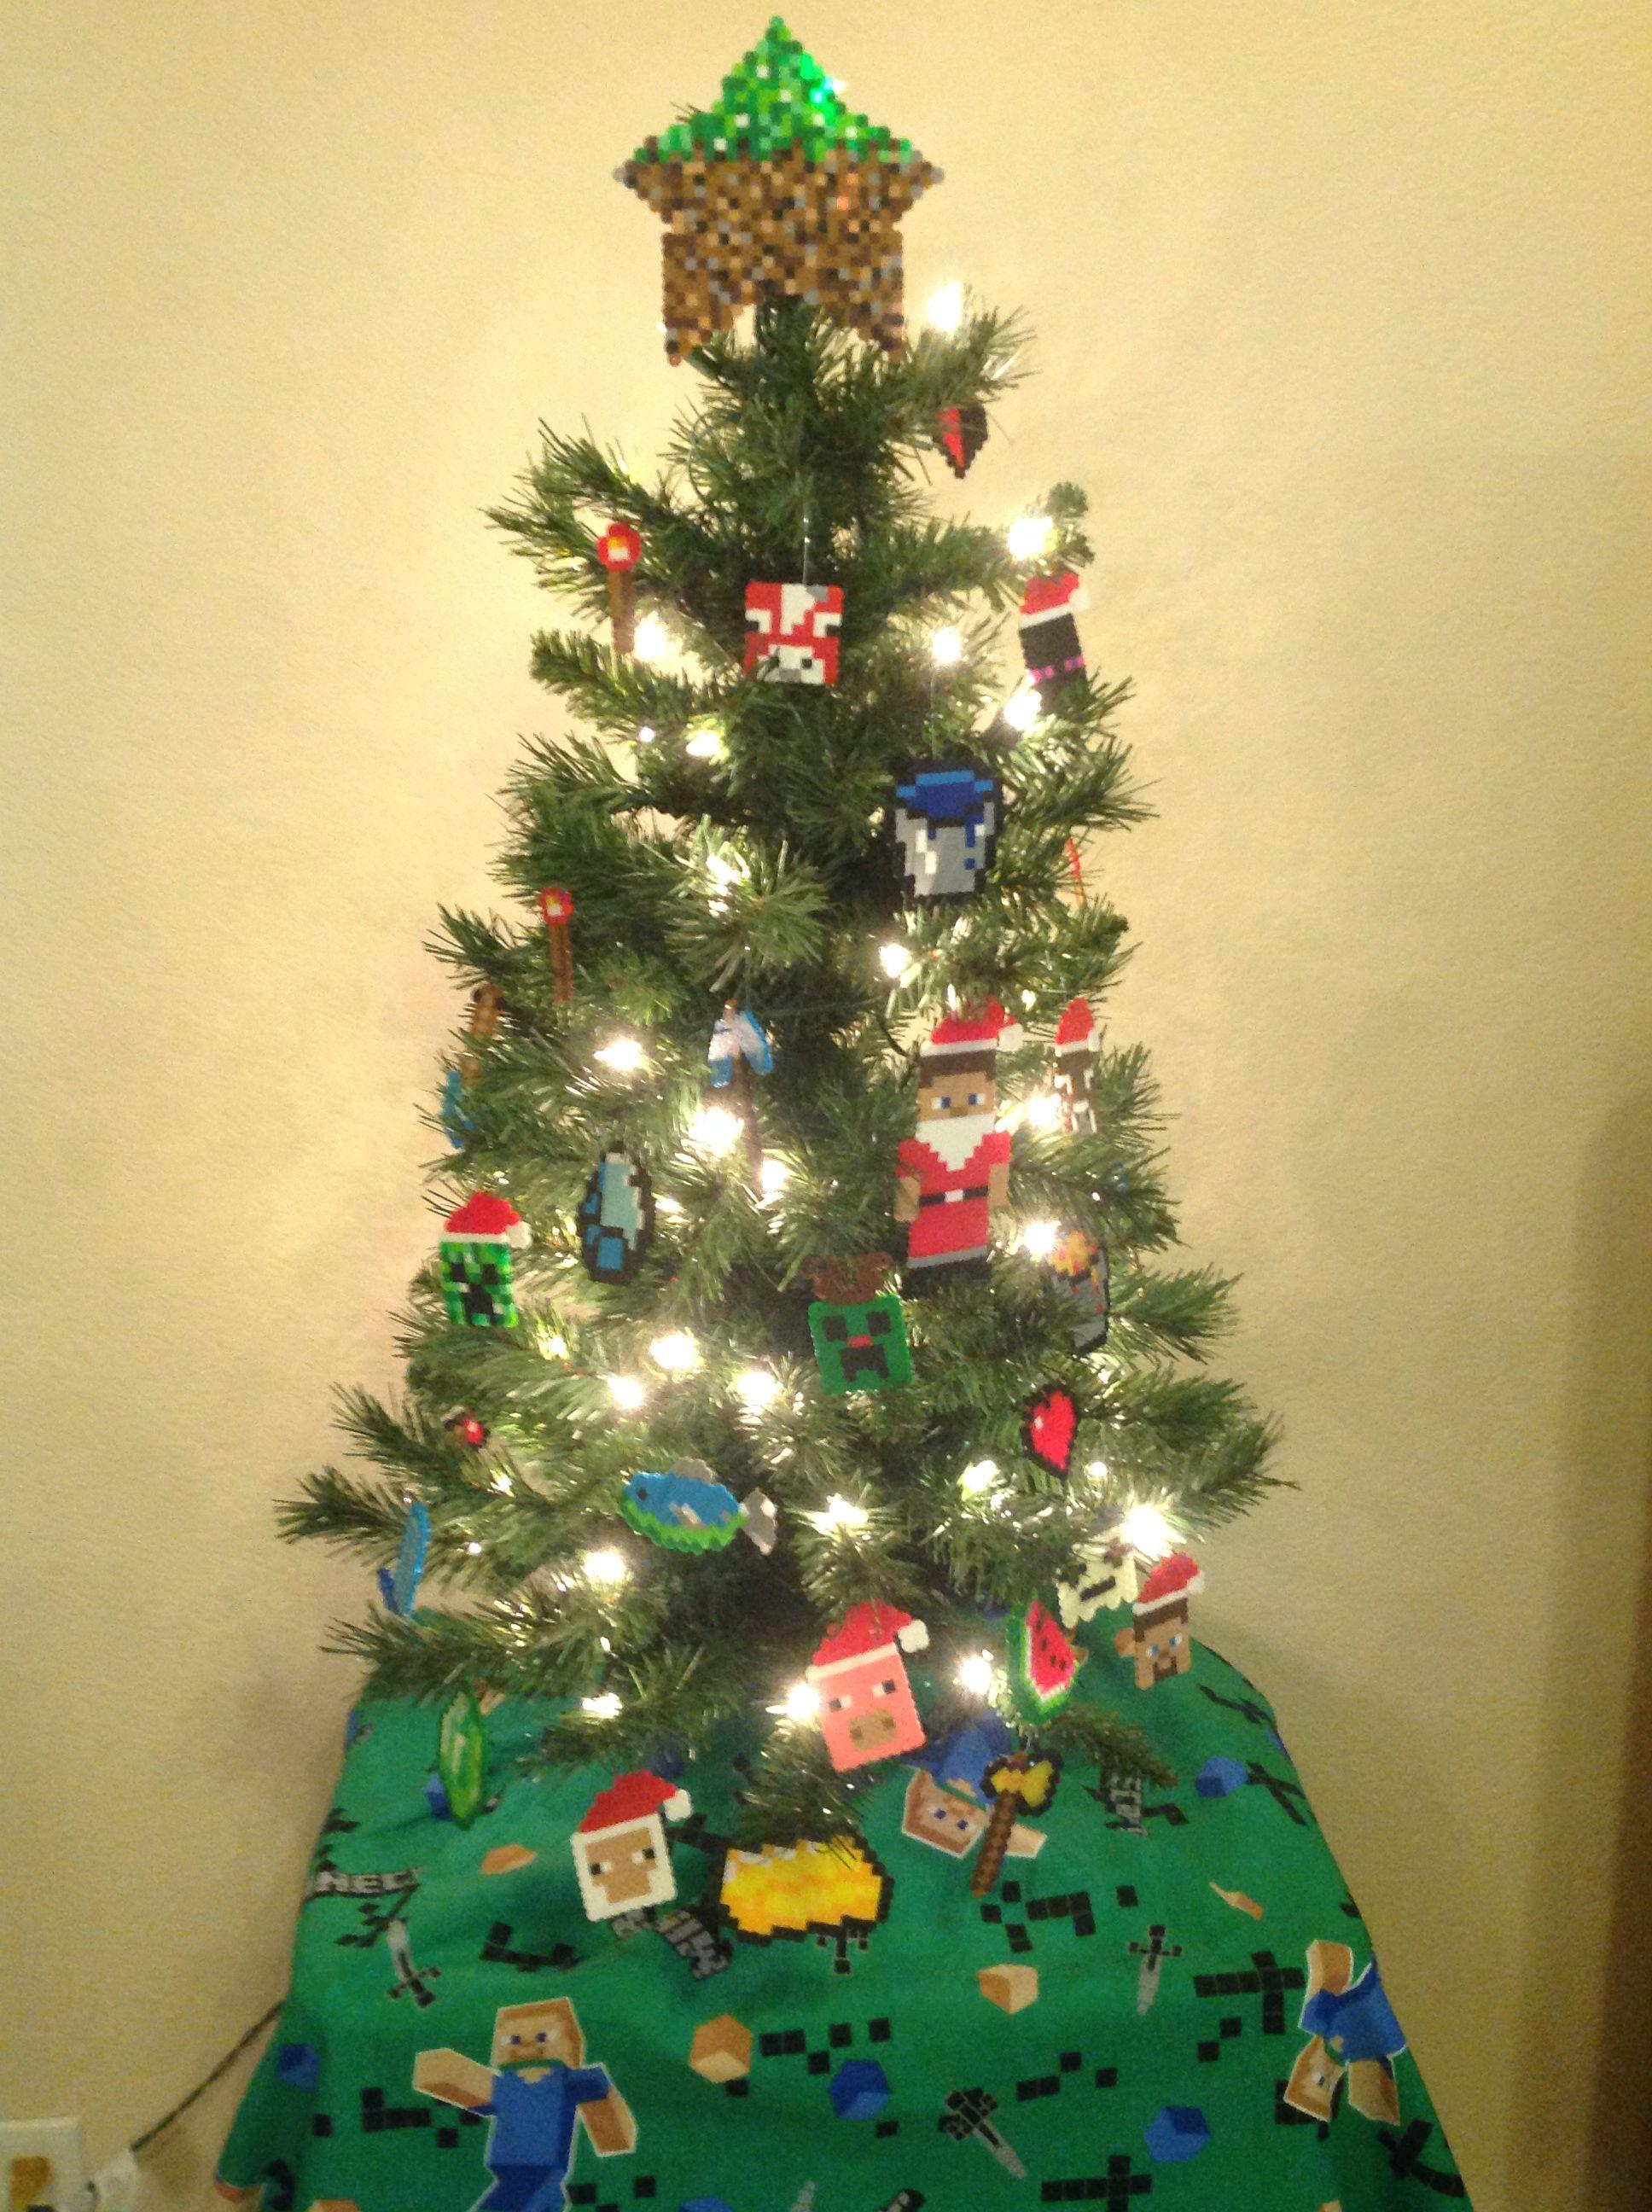 Minecraft Christmas Tree.Minecraft Steve Creeper Ghast Diamond Sword Picaxe Santa